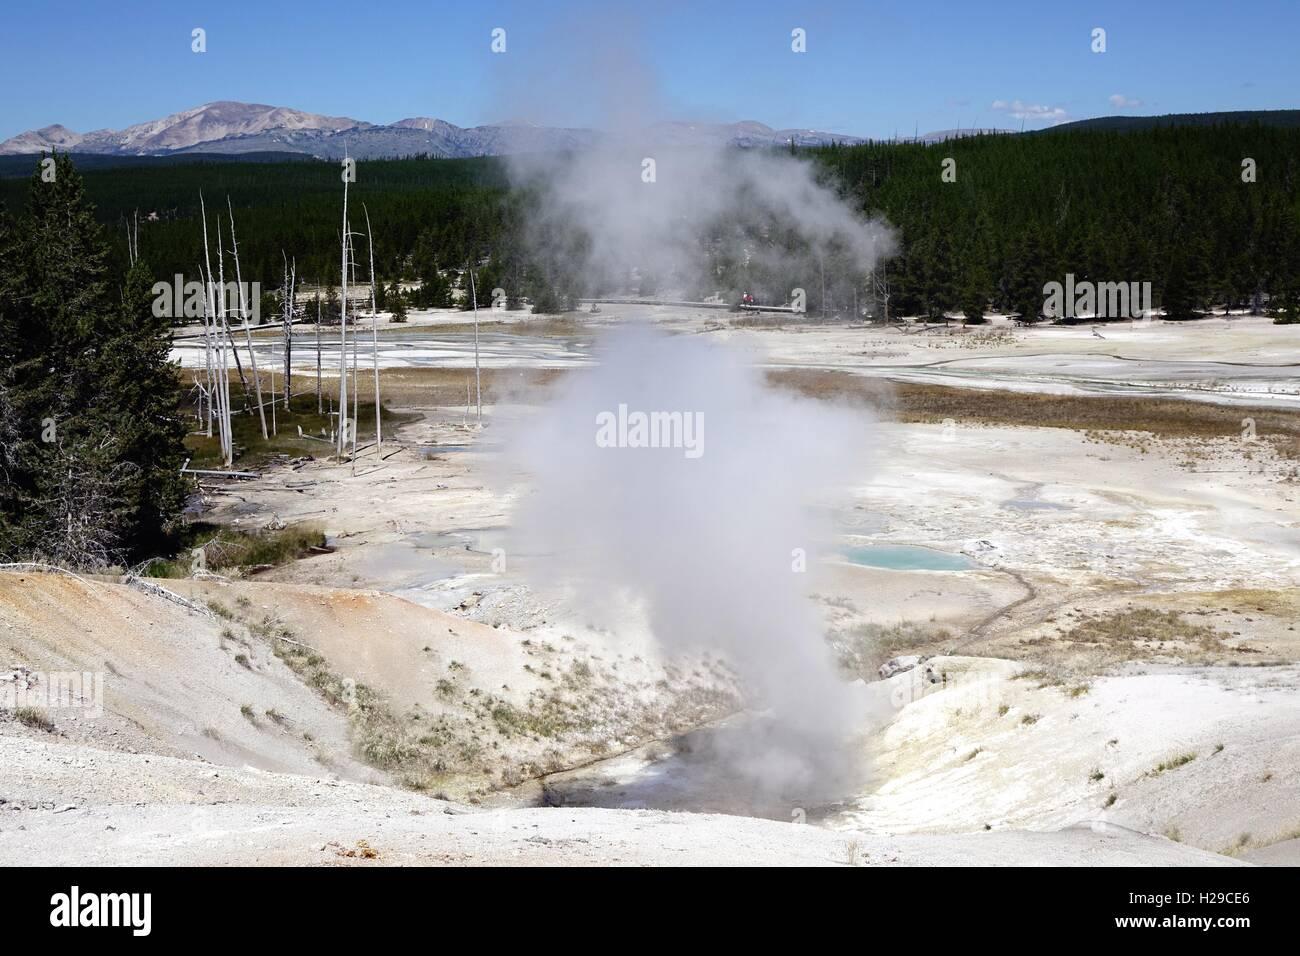 Steam vent, Porcelain basin, Norris Geyser Basin, Yellowstone National Park. fumarole - Stock Image